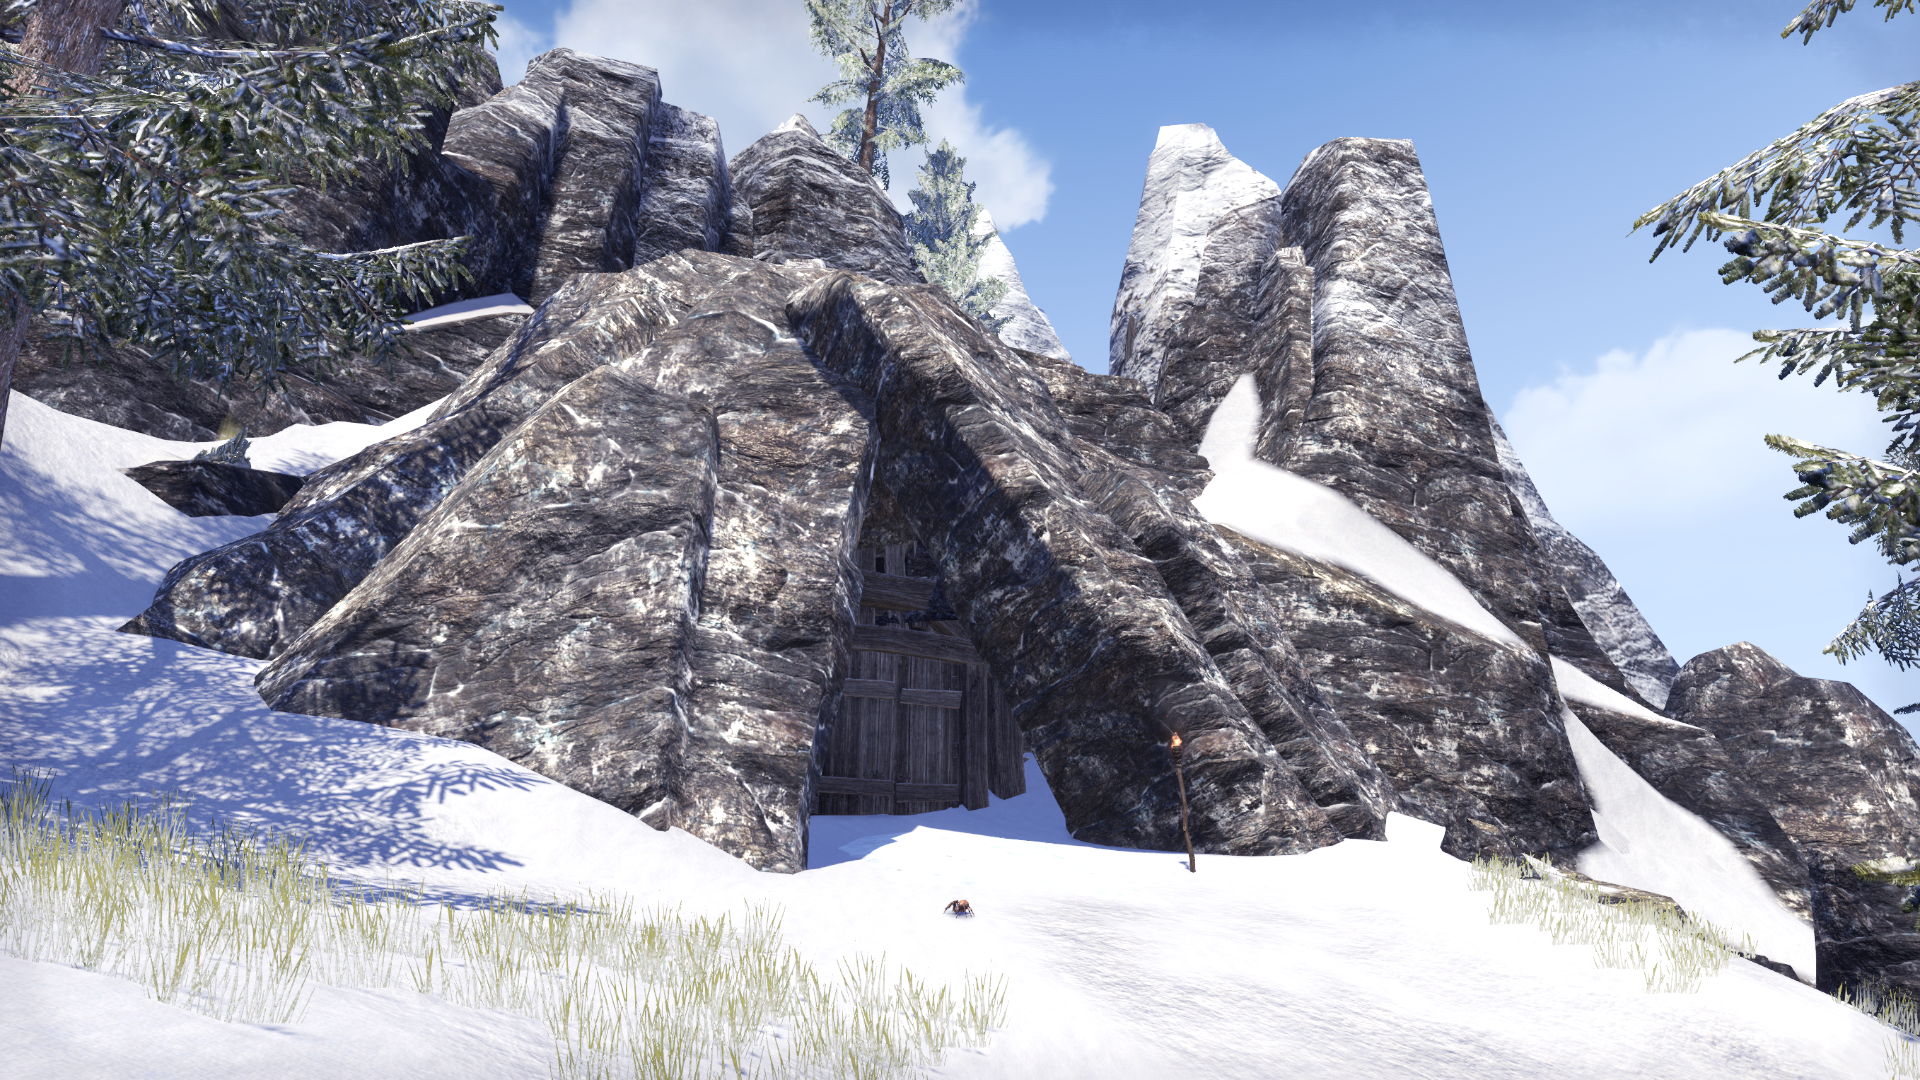 The Frigid Grotto